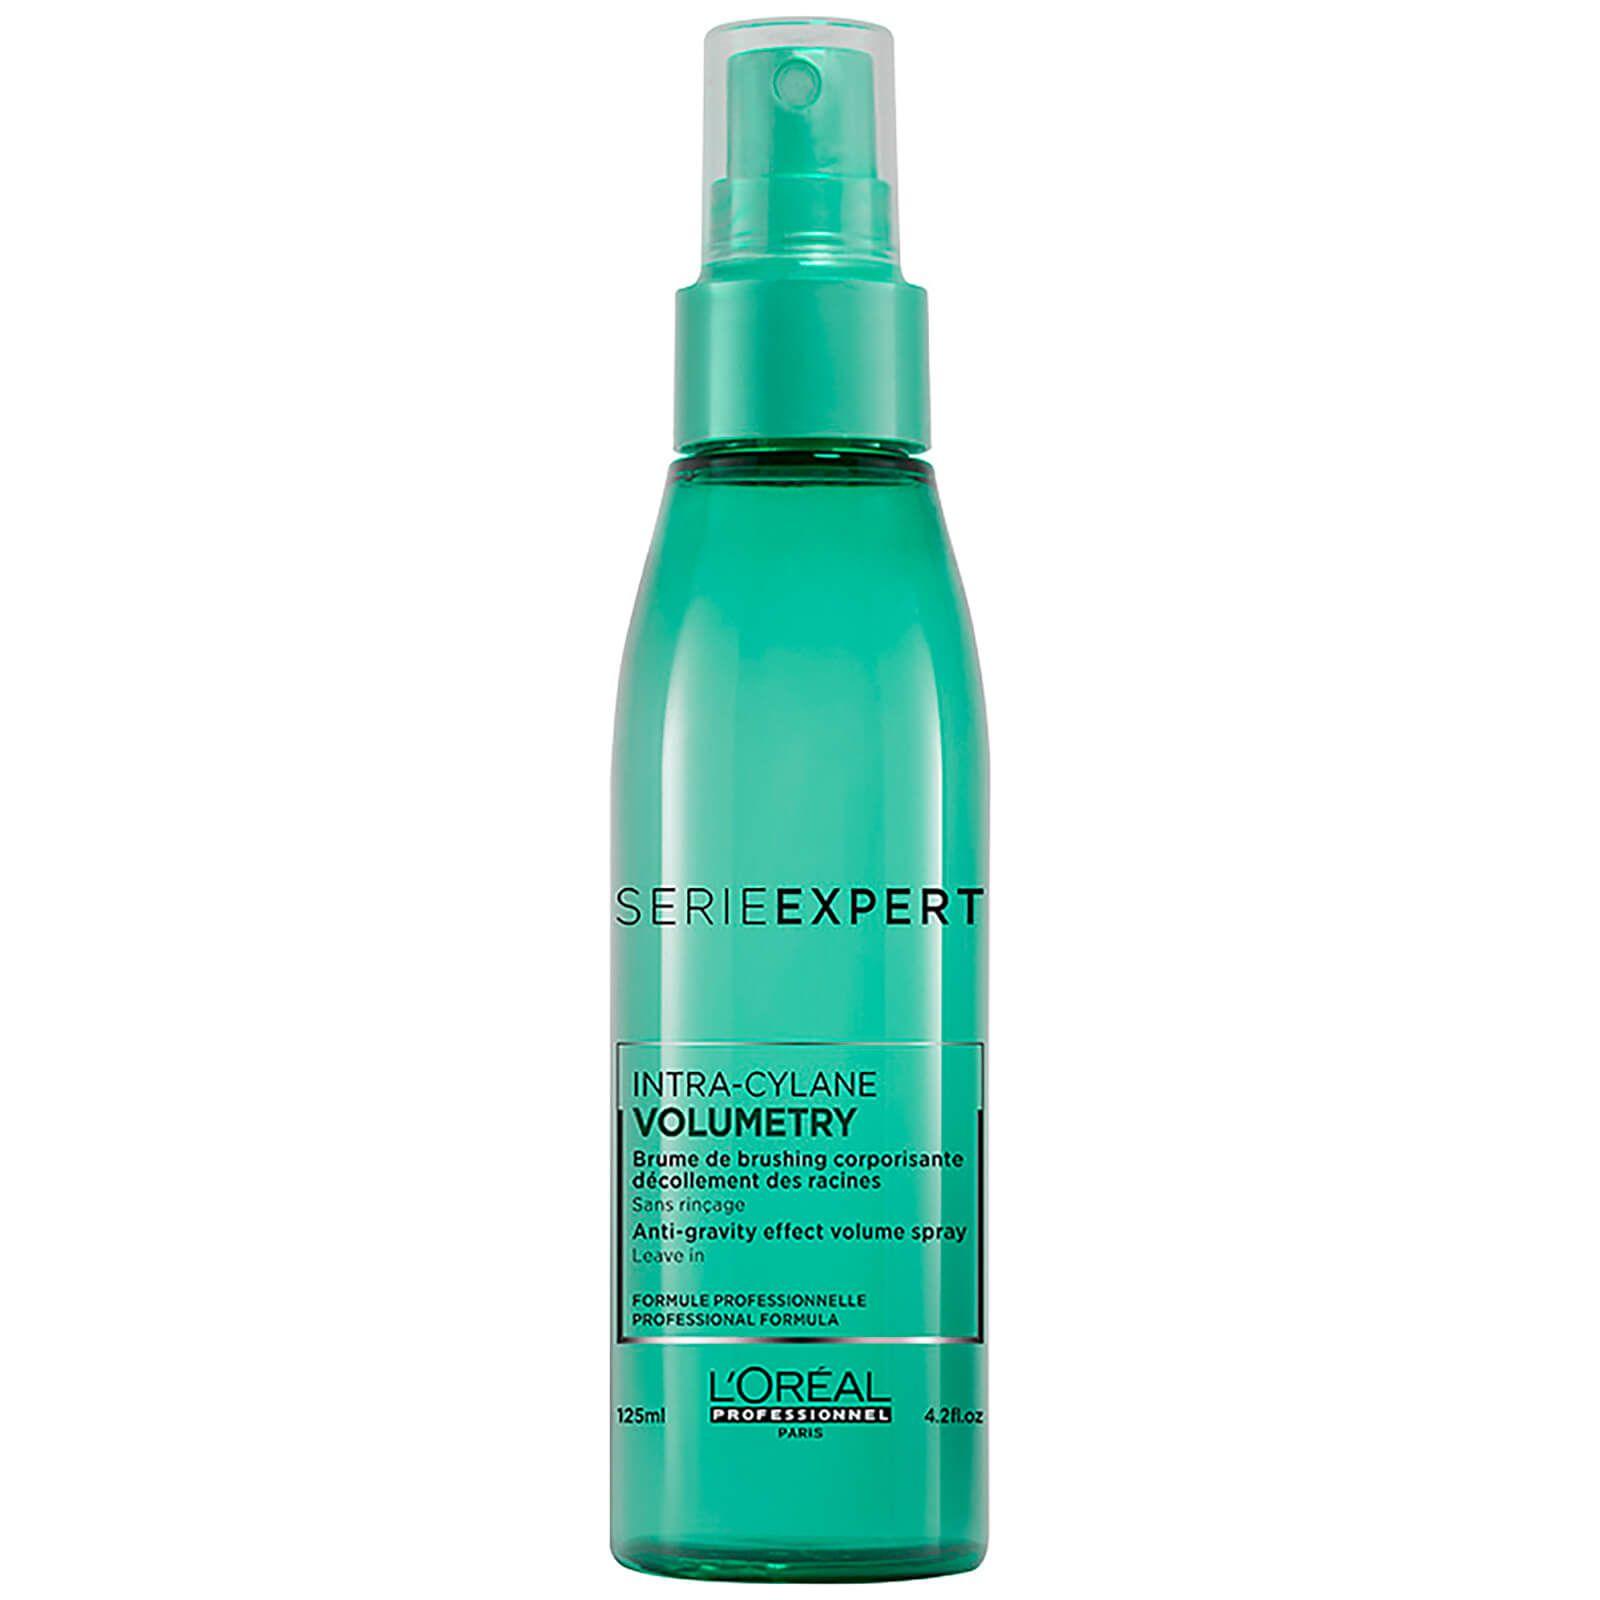 L'Oréal Professionnel Serie Expert Volumetry Root Spray - 125ml